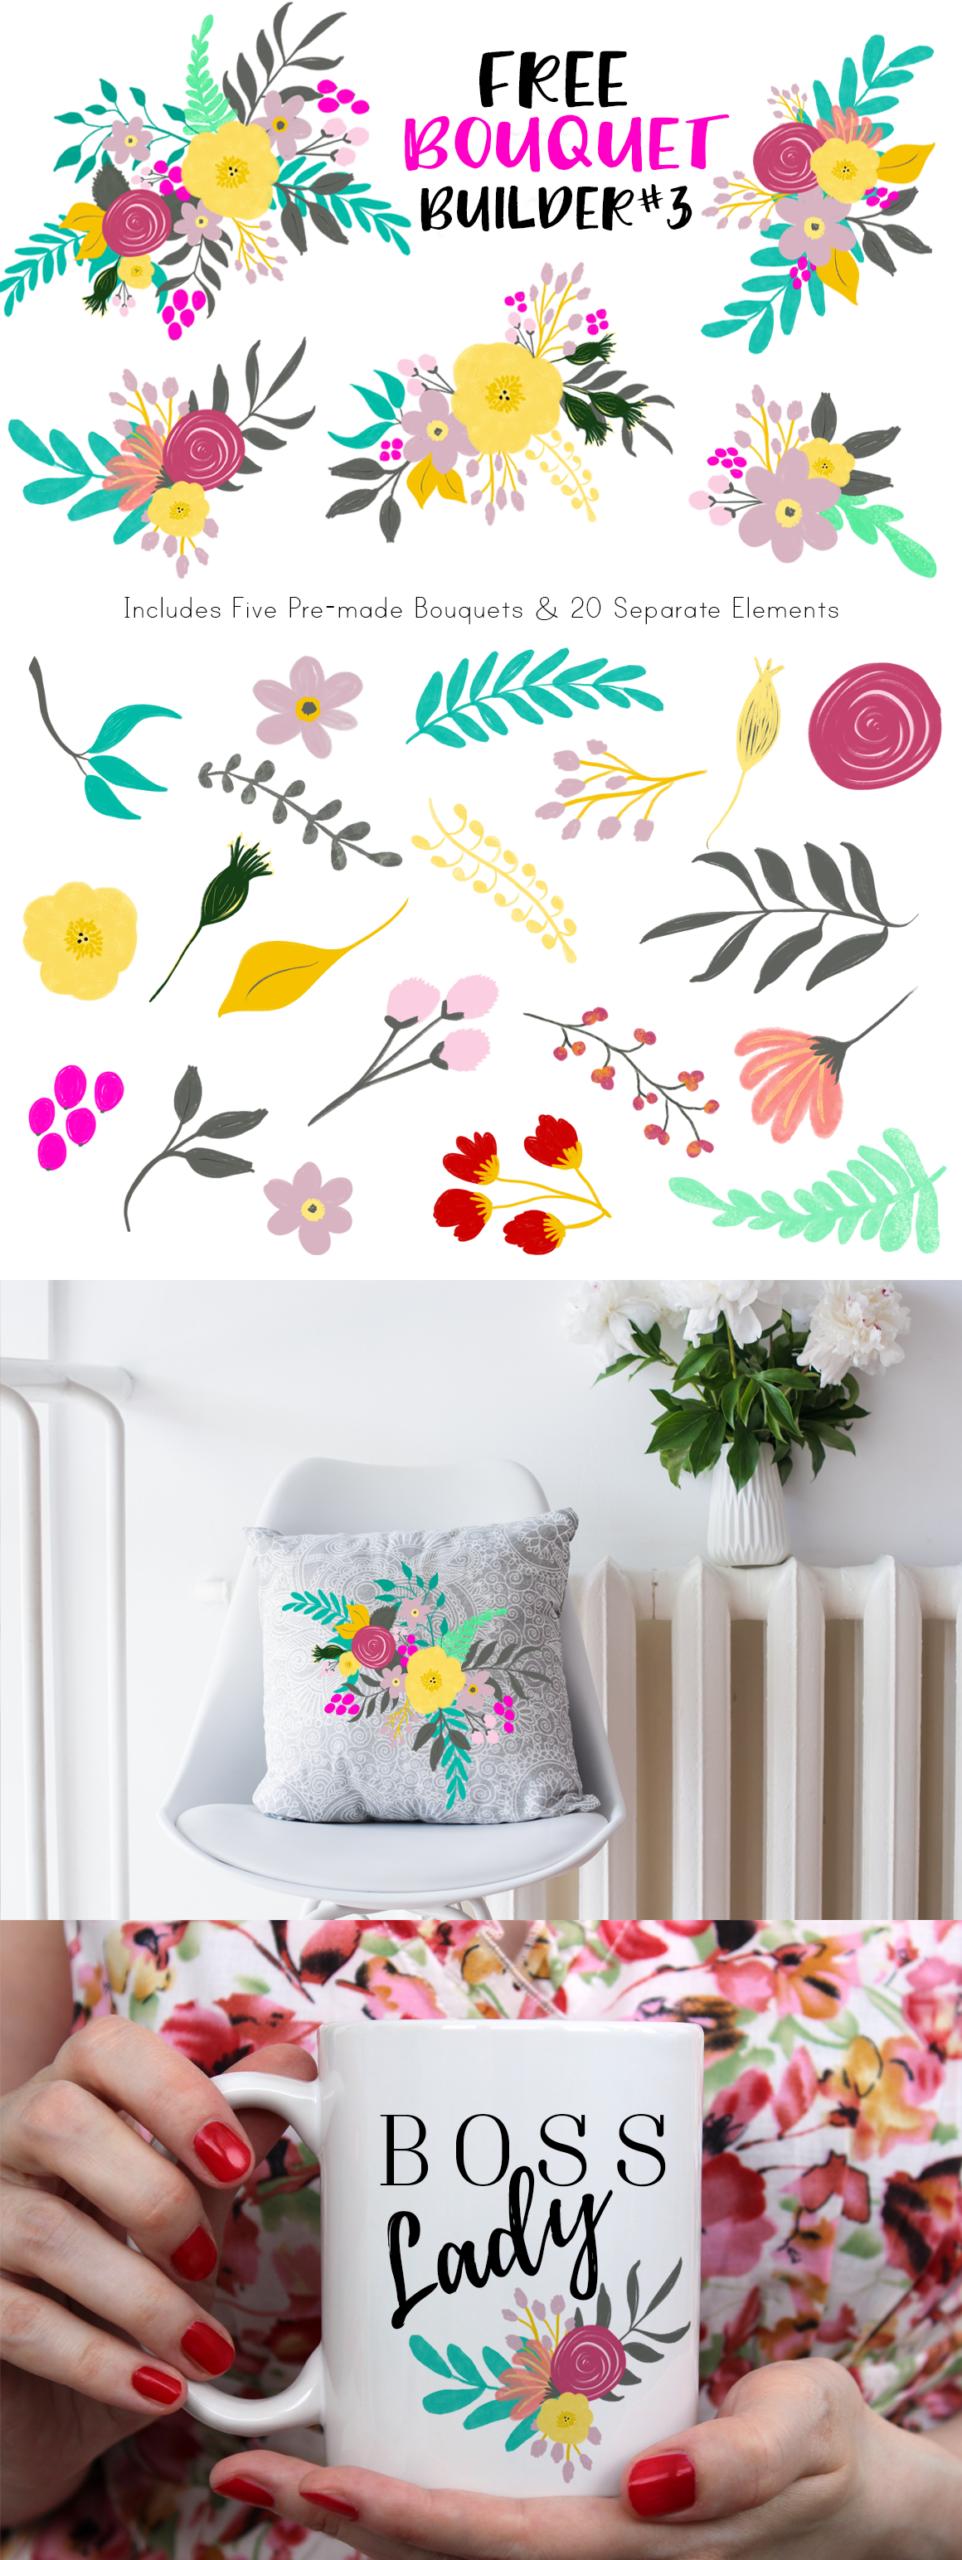 Free Floral Bouquet Graphics